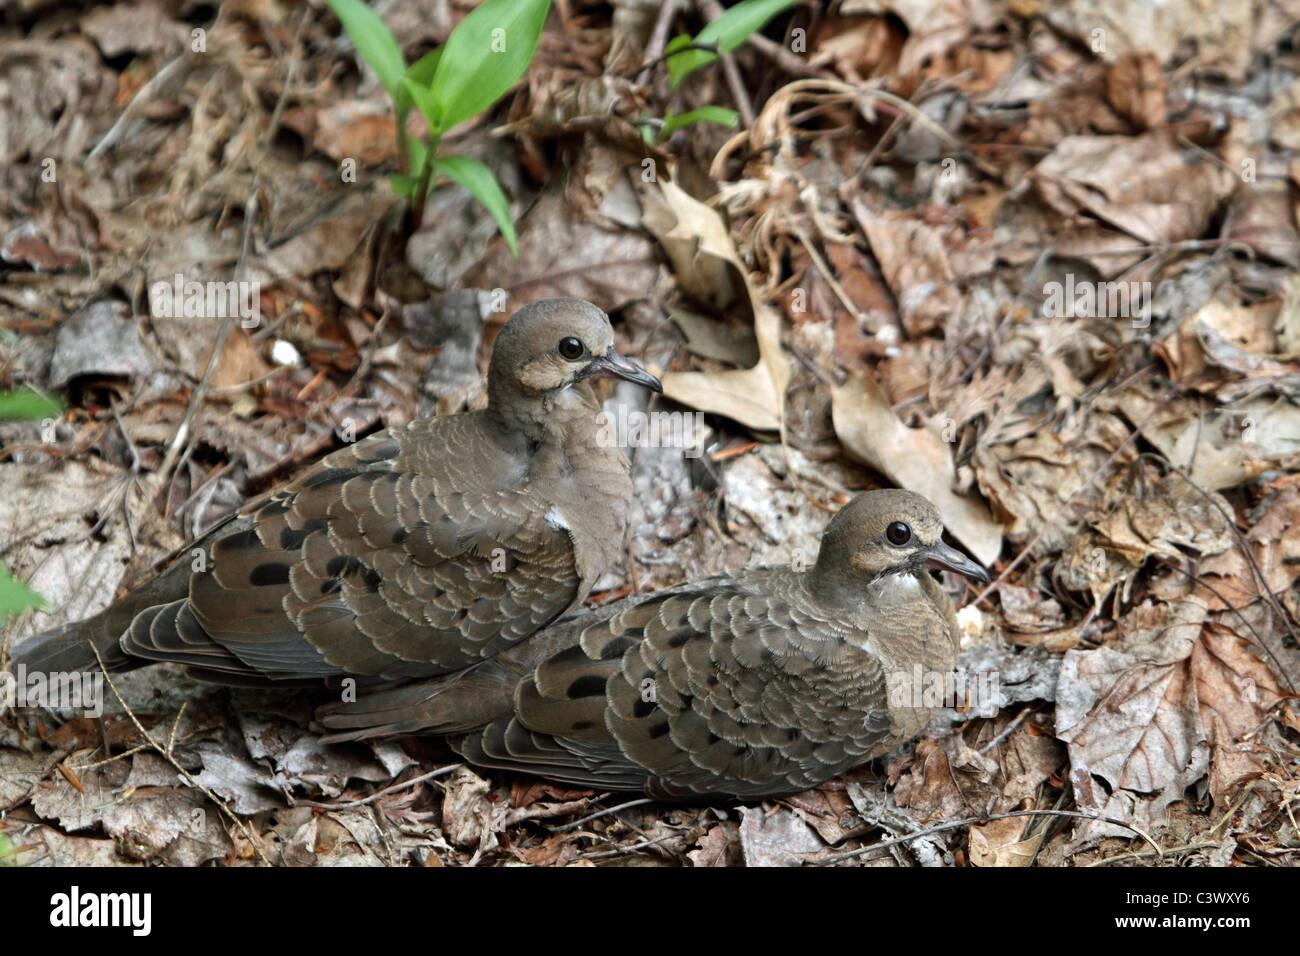 Mourning Dove fledglings, Zenaida macroura, huddling - Stock Image